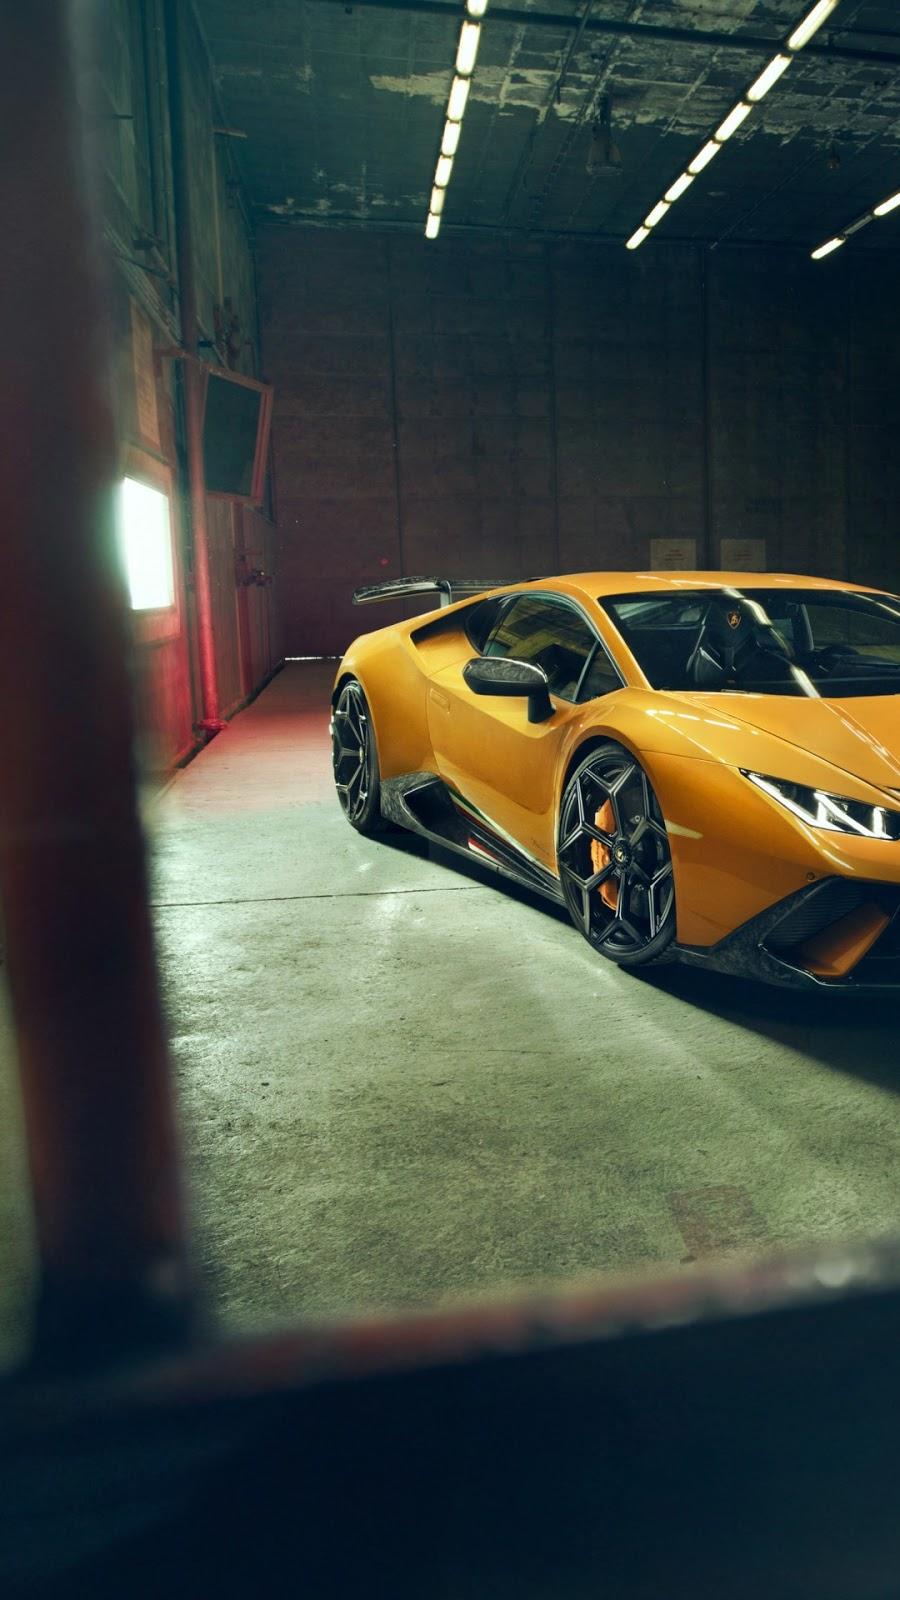 Papel de parede grátis Lamborghini Huracan Performante Novitec para PC, Notebook, iPhone, Android e Tablet.